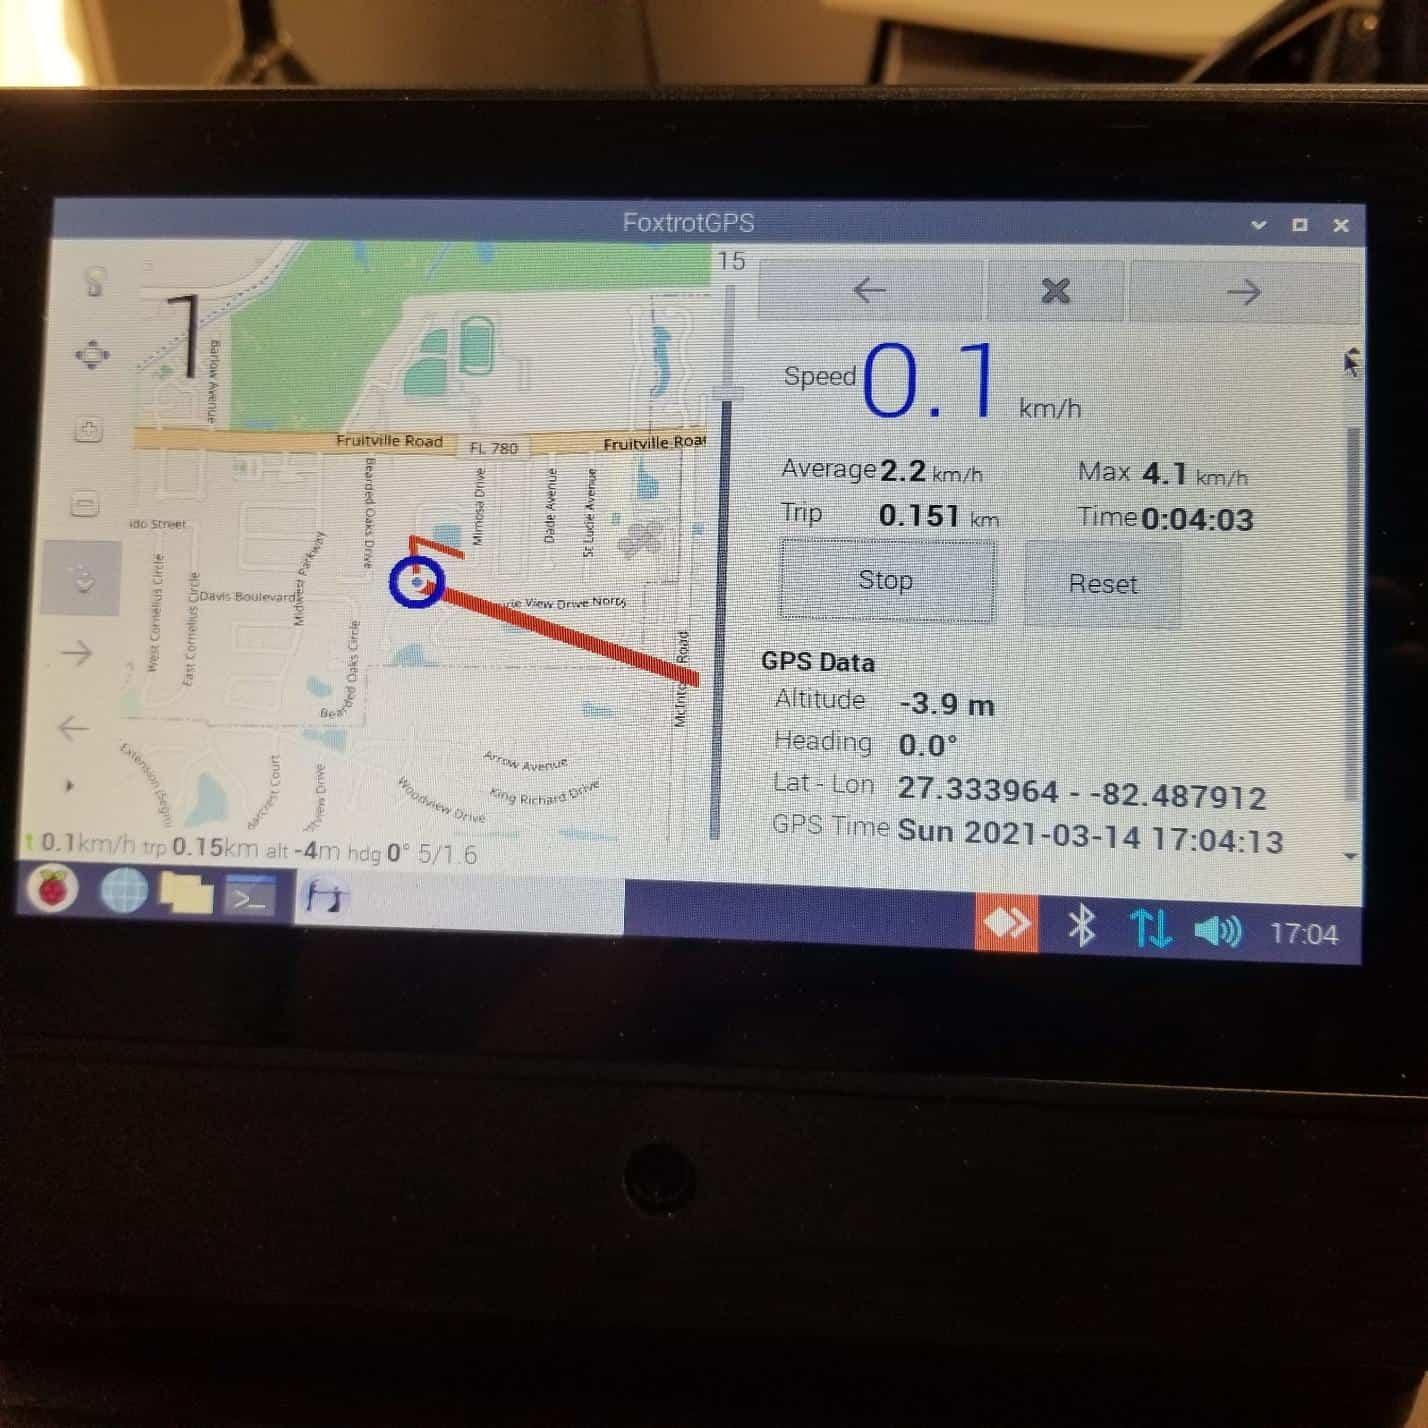 Foxtrot GPS program